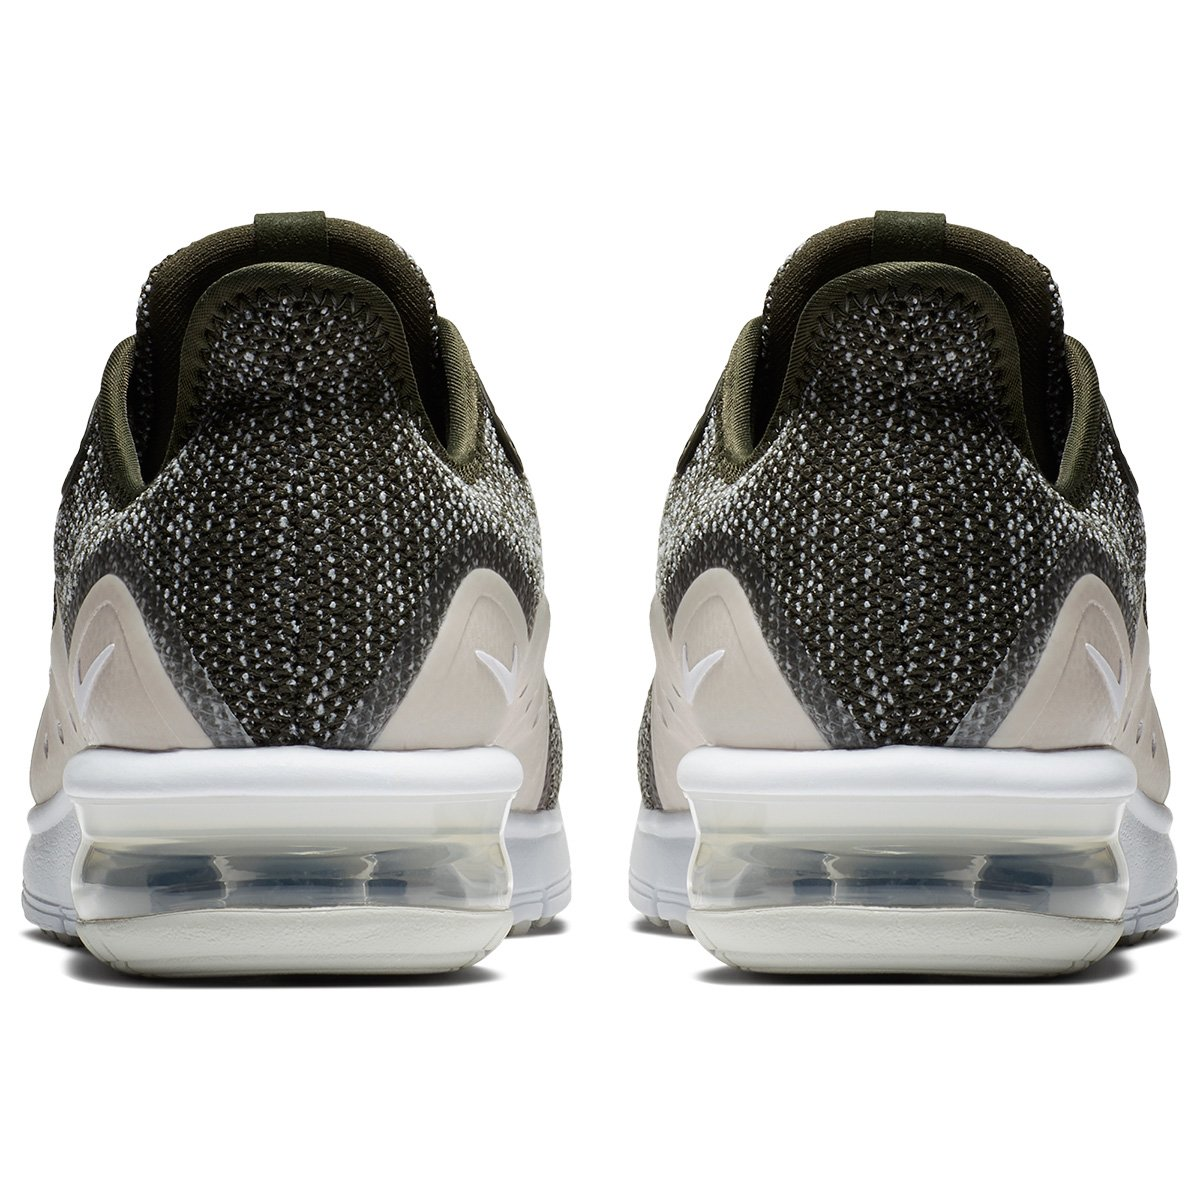 Tênis Nike Air Max Fury Sequent 3 Feminino - Verde e Branco - Compre ... d0eec573103f7